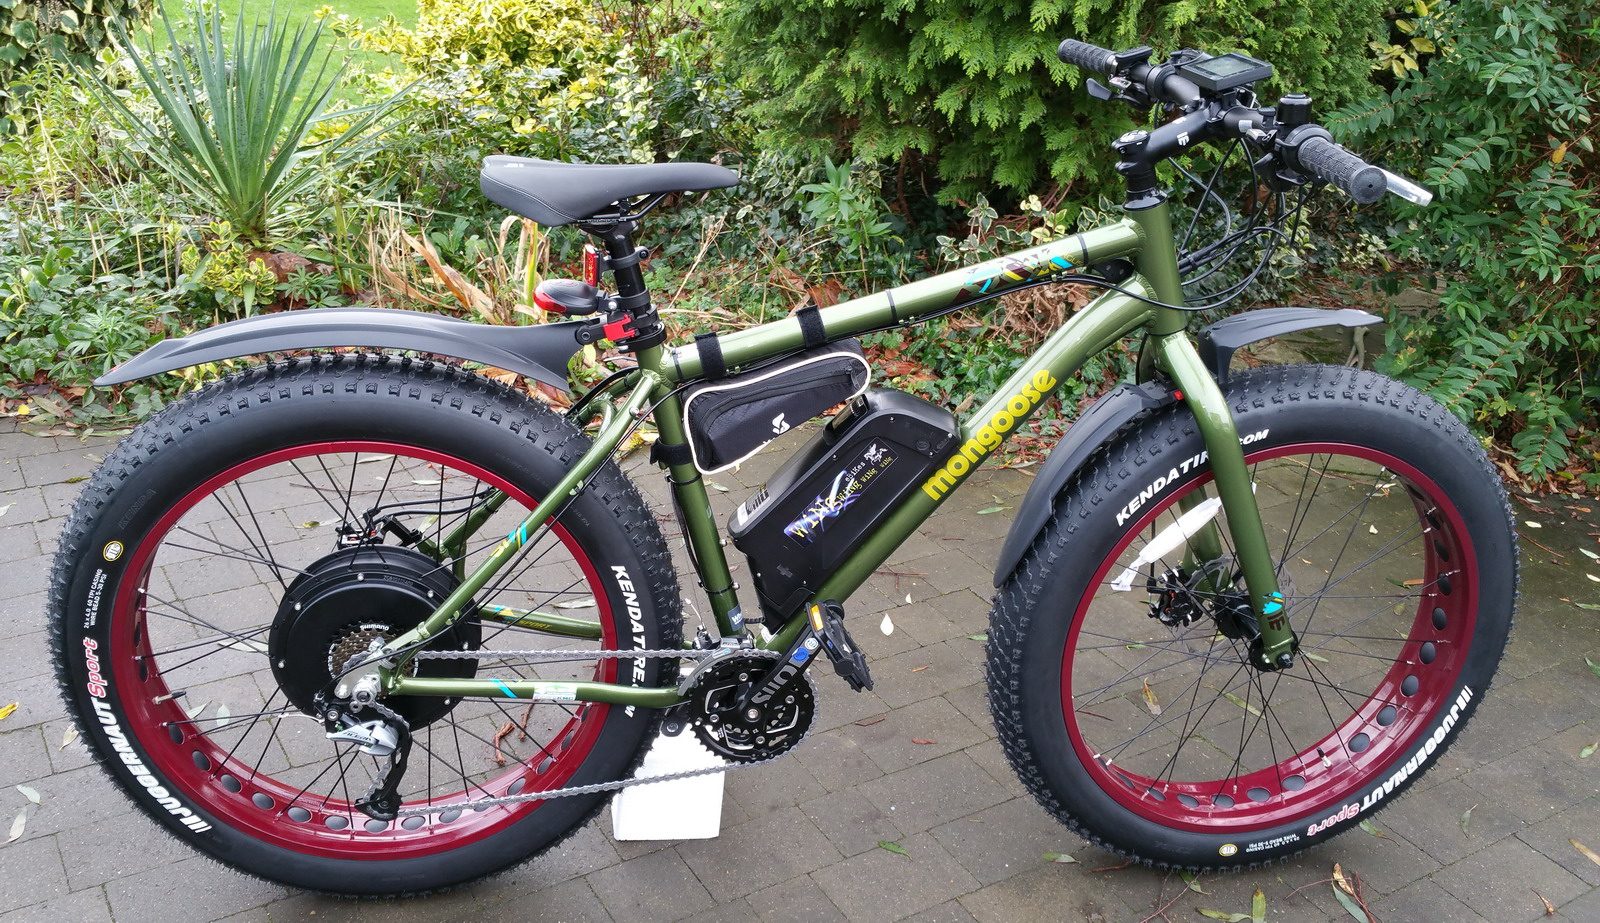 Electric Bike - Mongoose Argus Fat Bike 35mph Very Fast